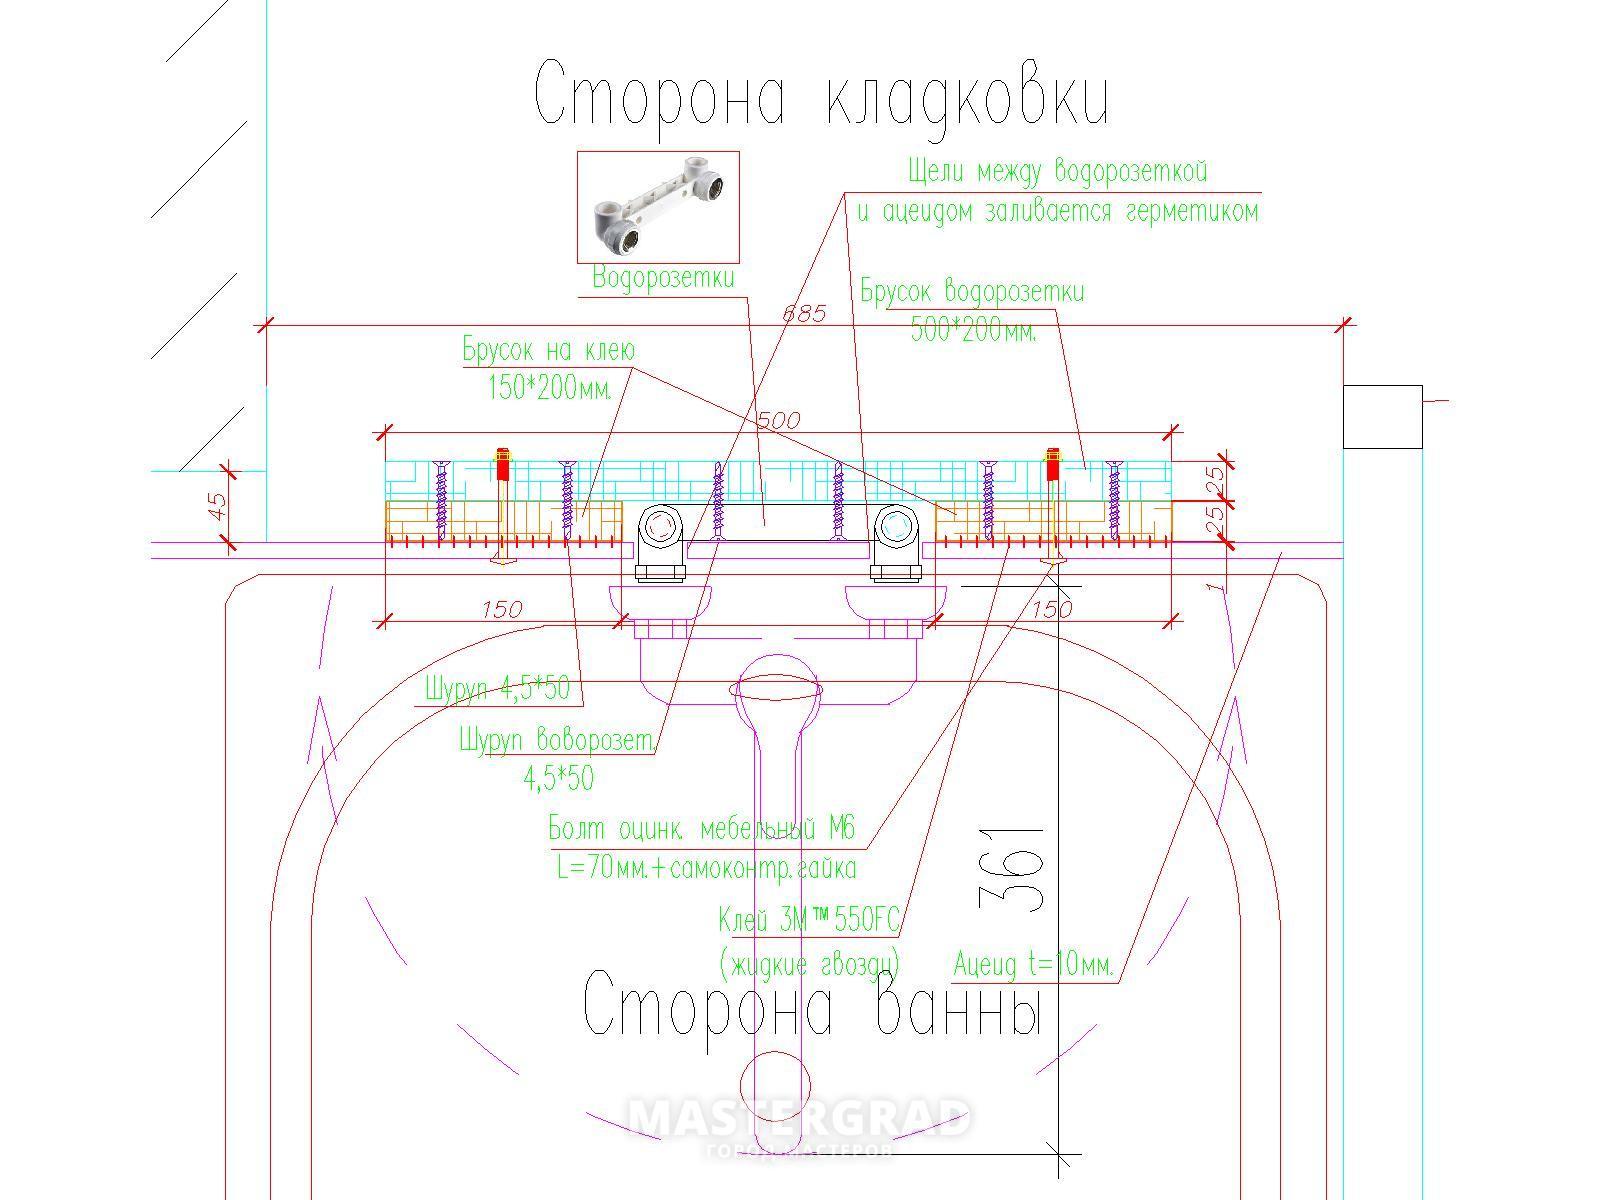 схема фильтра honeywell fk06-3/4 aam